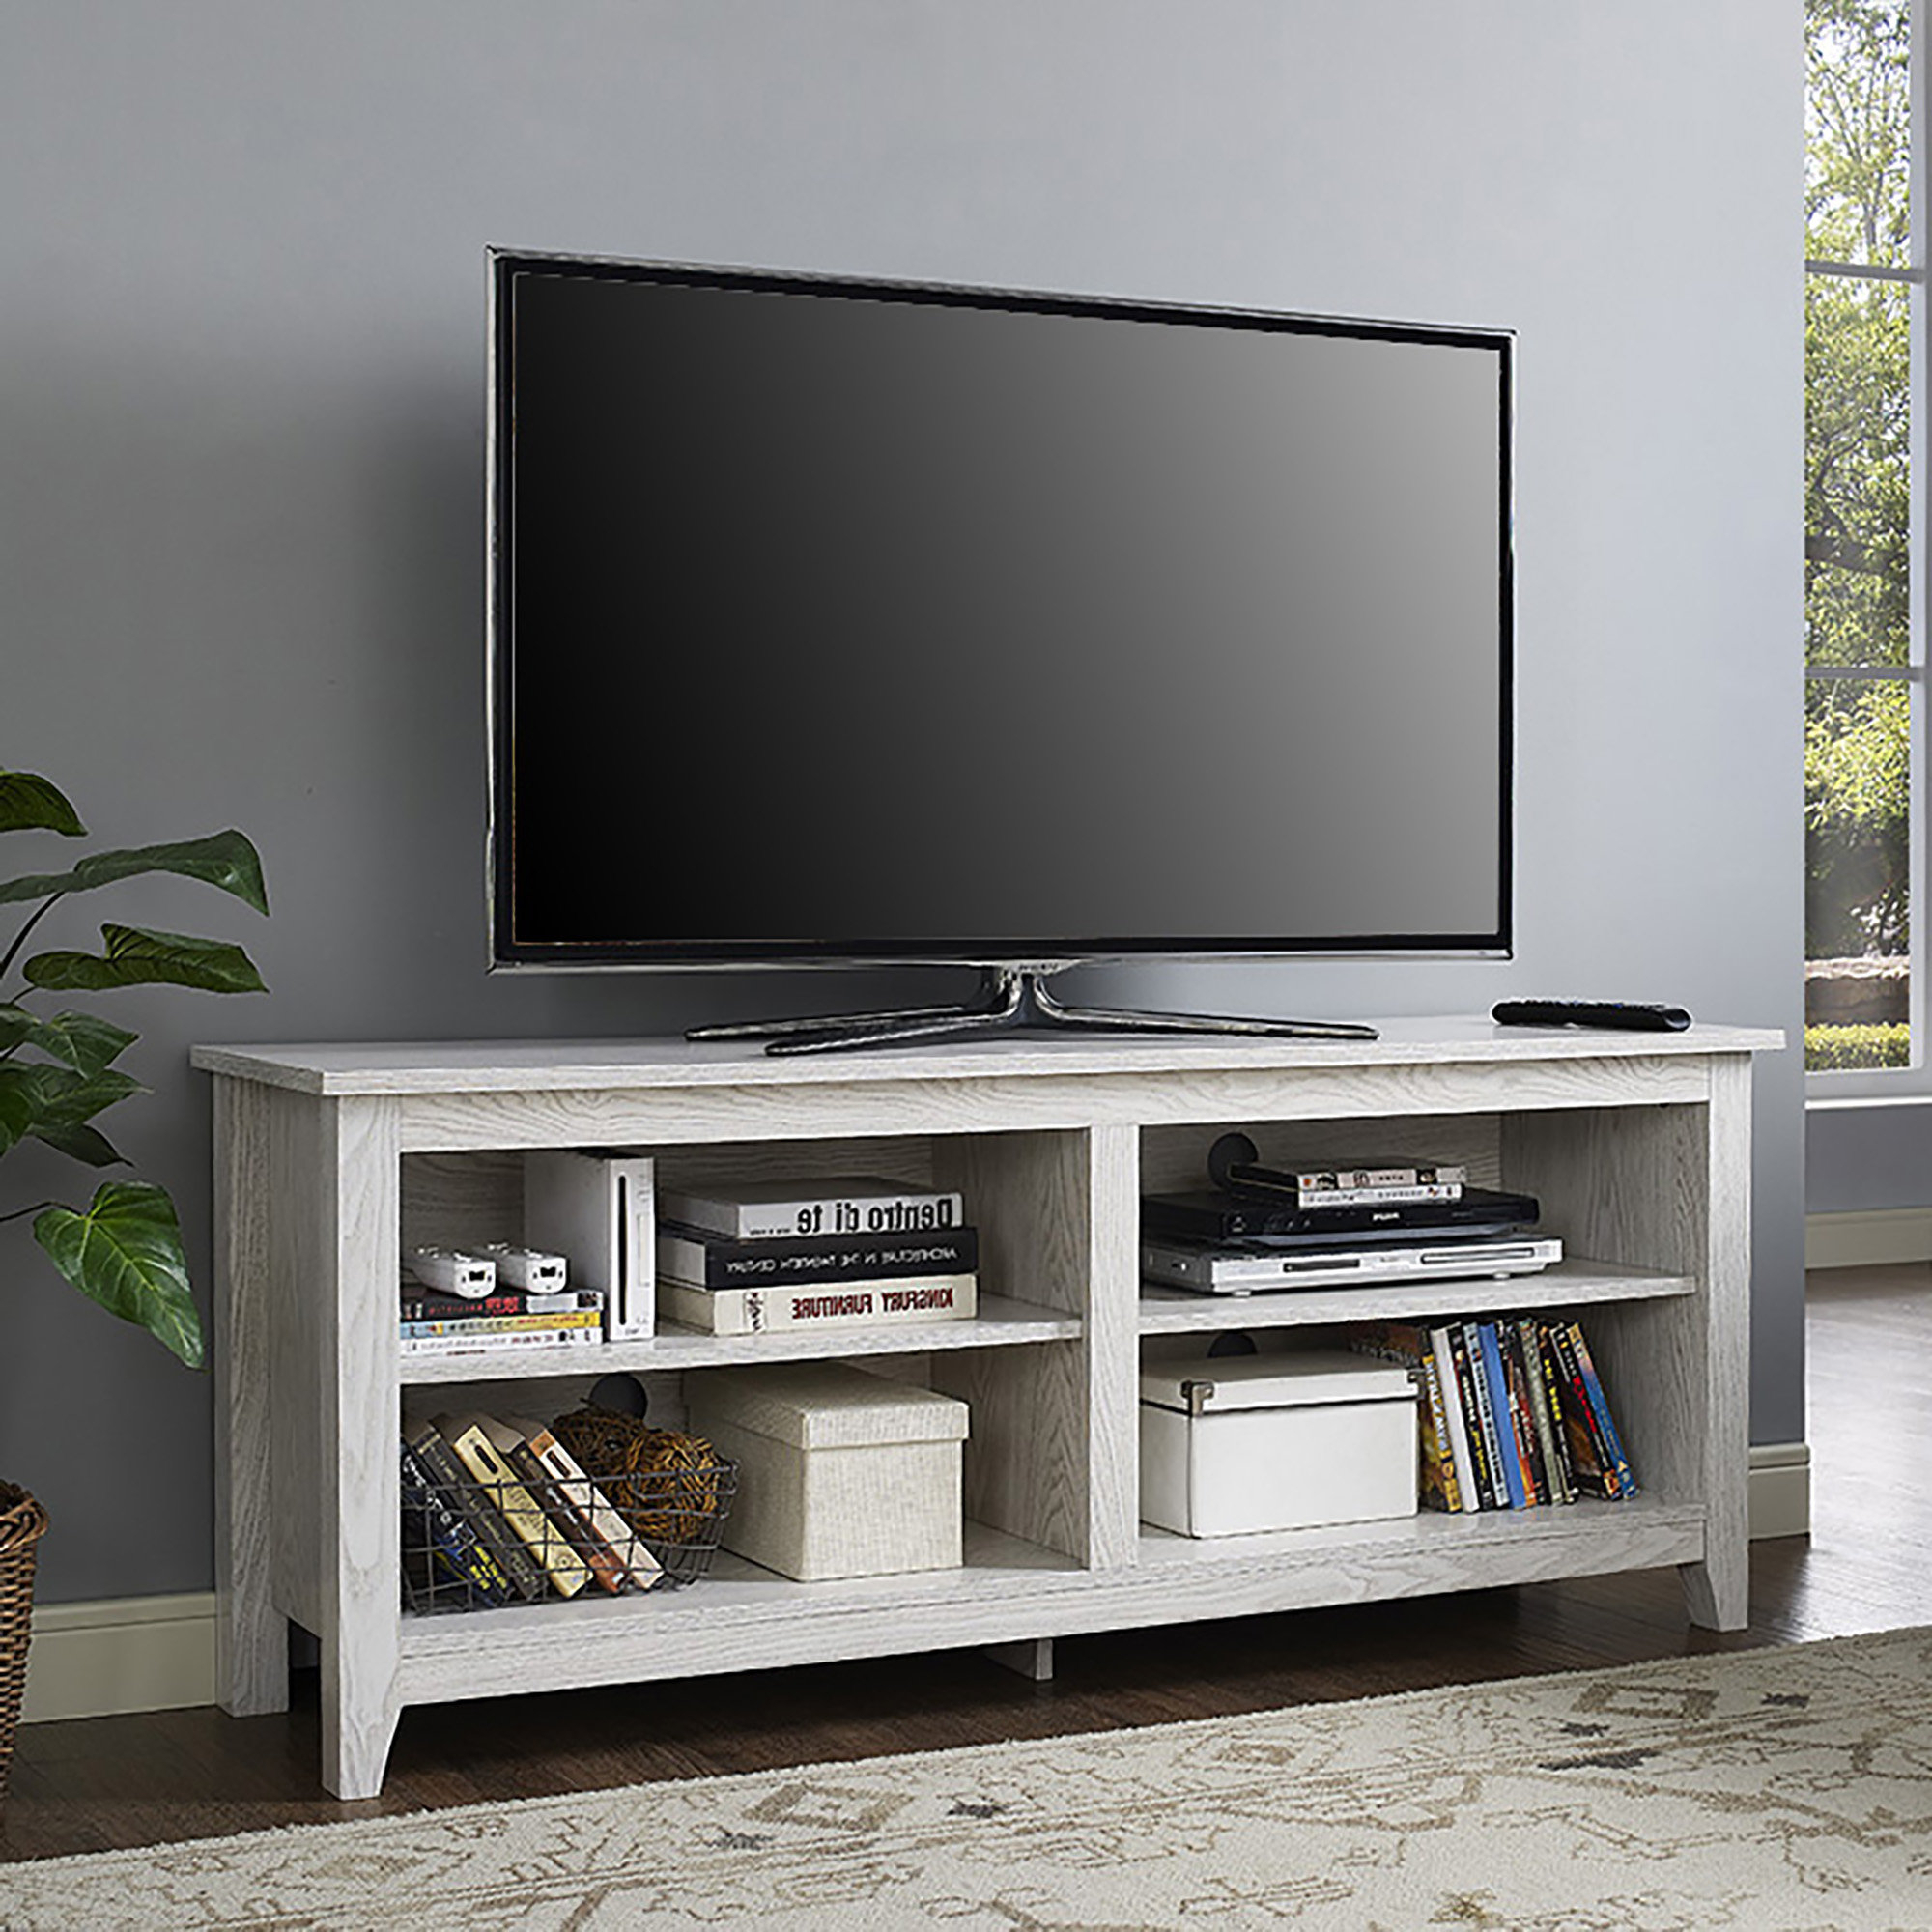 Cream Colored Tv Stands | Wayfair Regarding Century Blue 60 Inch Tv Stands (View 6 of 20)